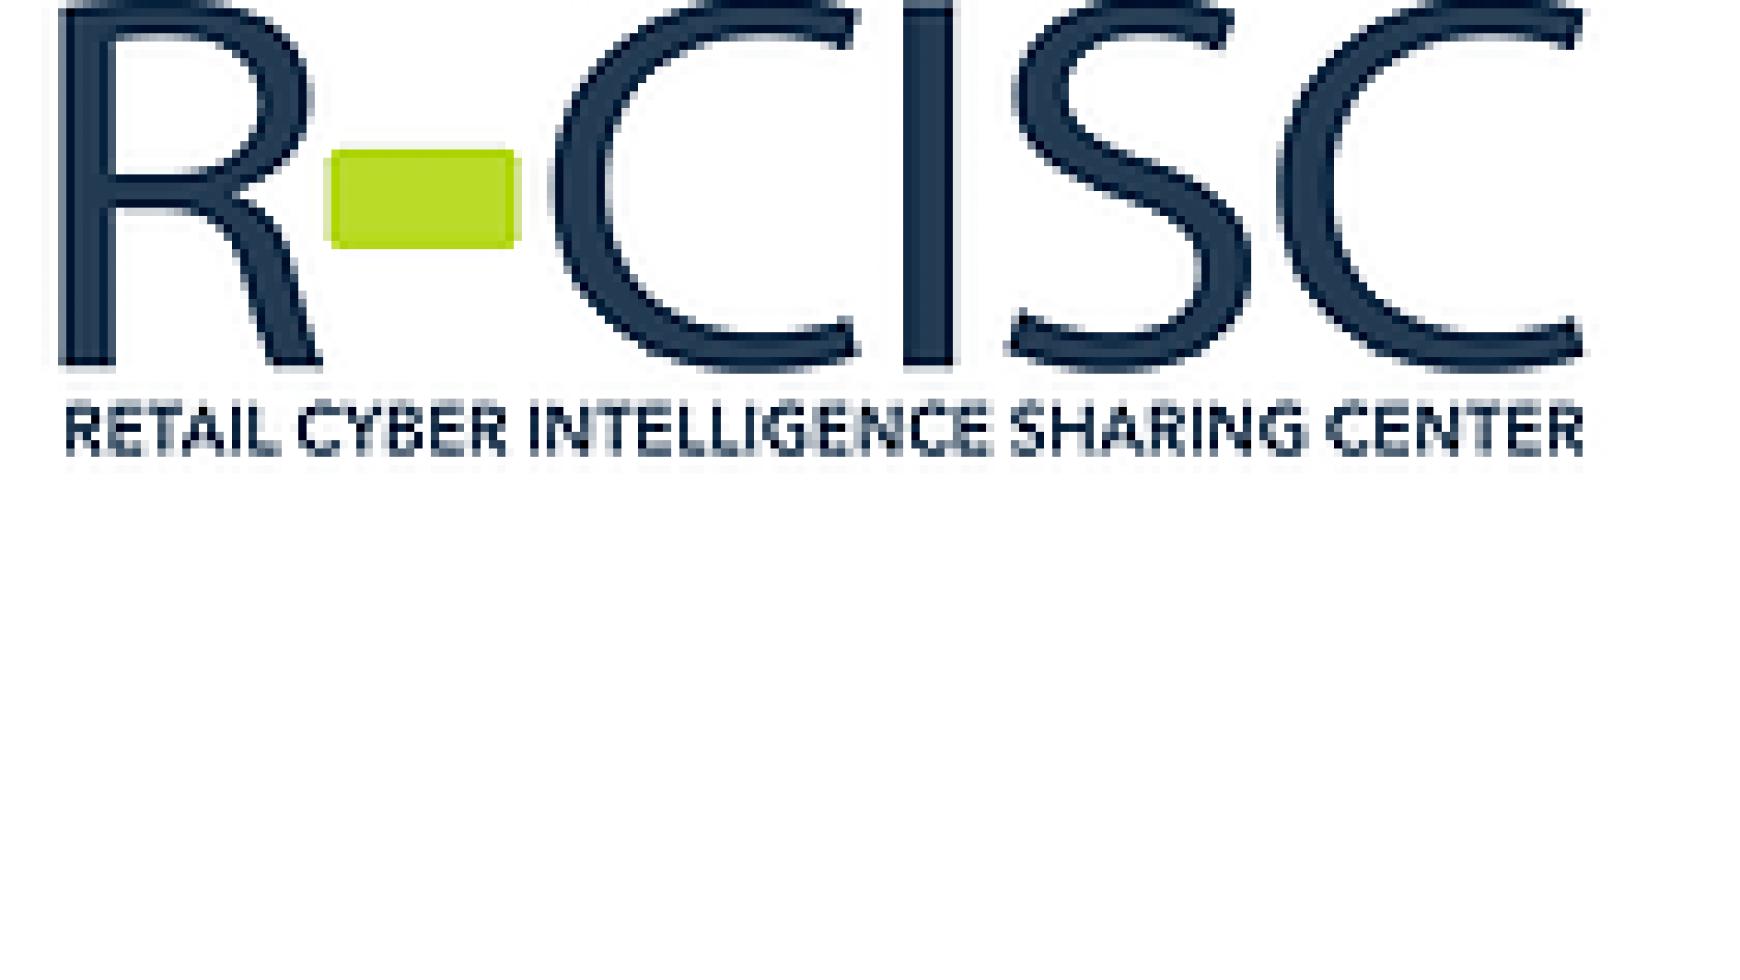 Retail Cyber Intelligence Sharing Center